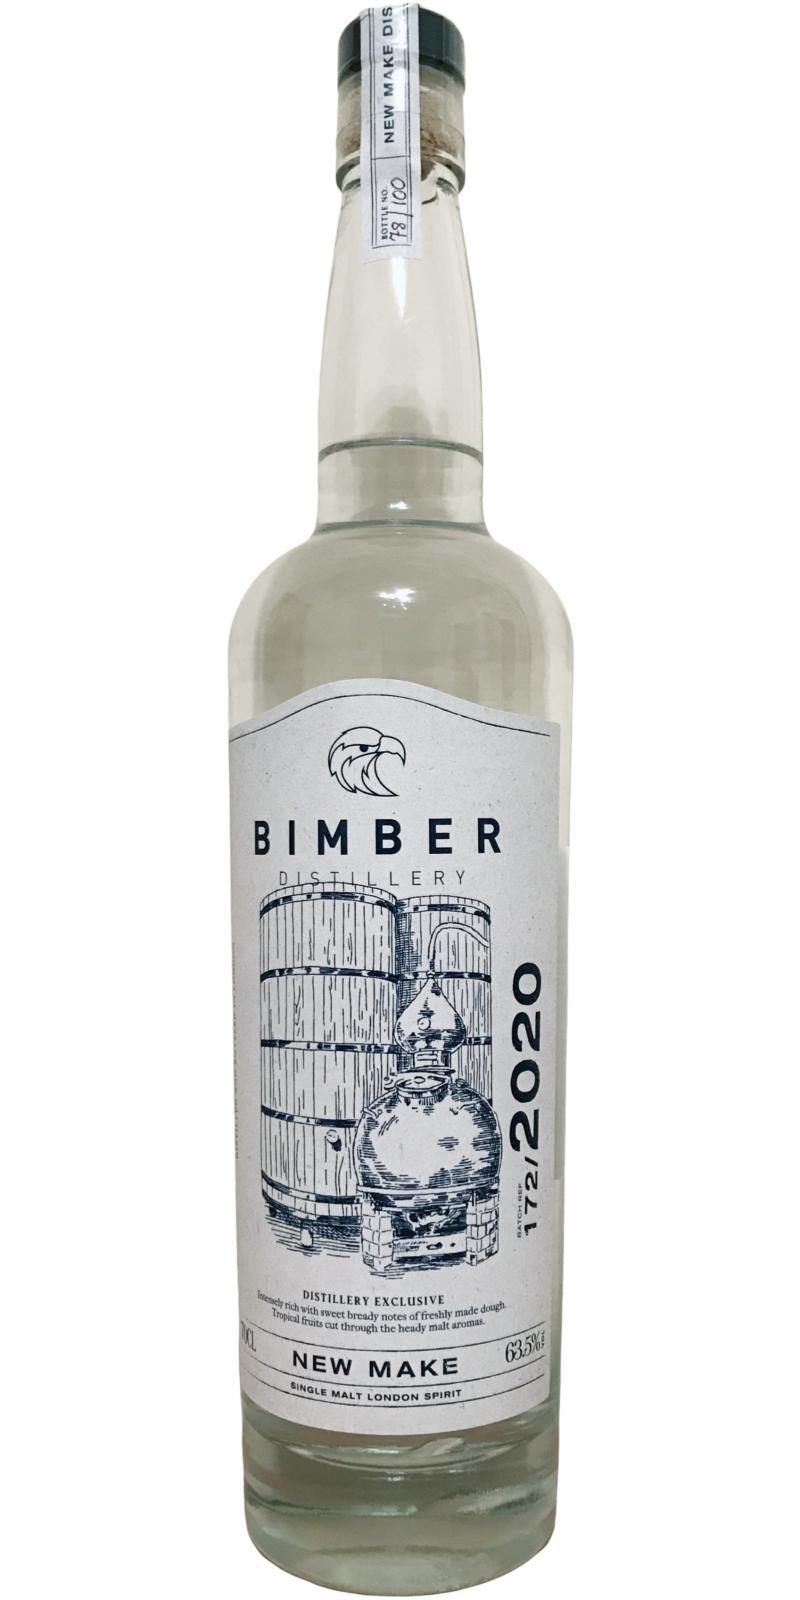 Bimber New Make